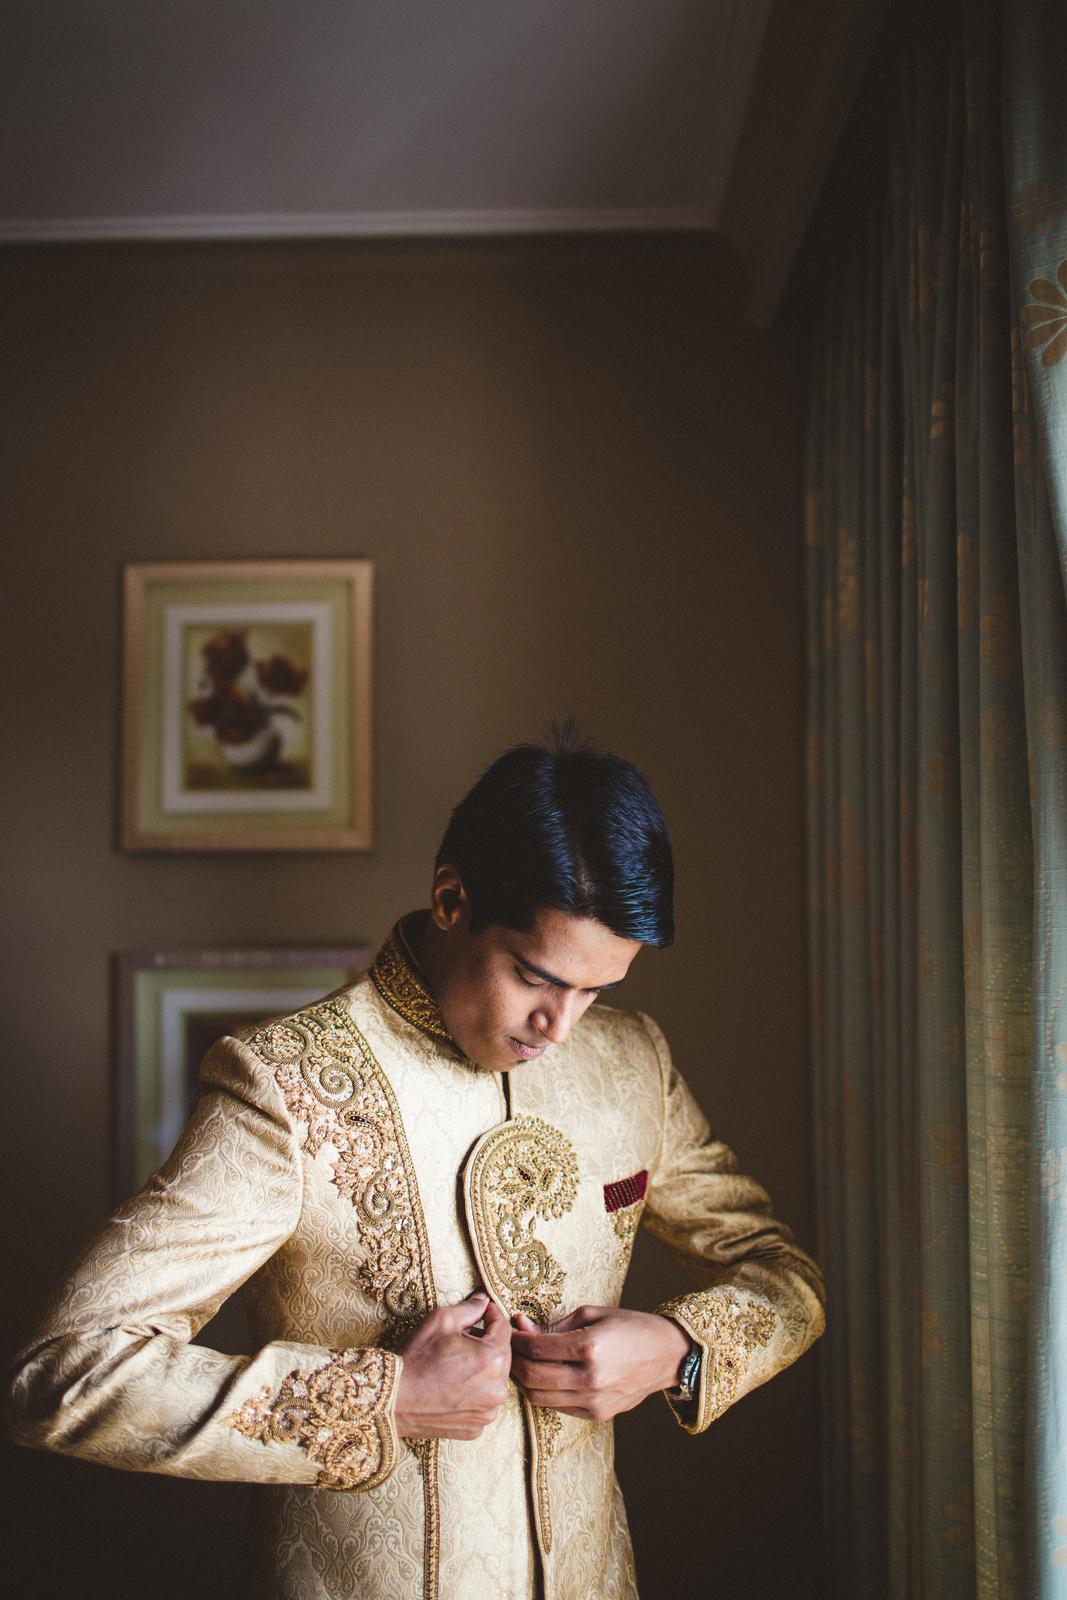 mumbai-candid-wedding-photographer-into-candid-av-24.jpg